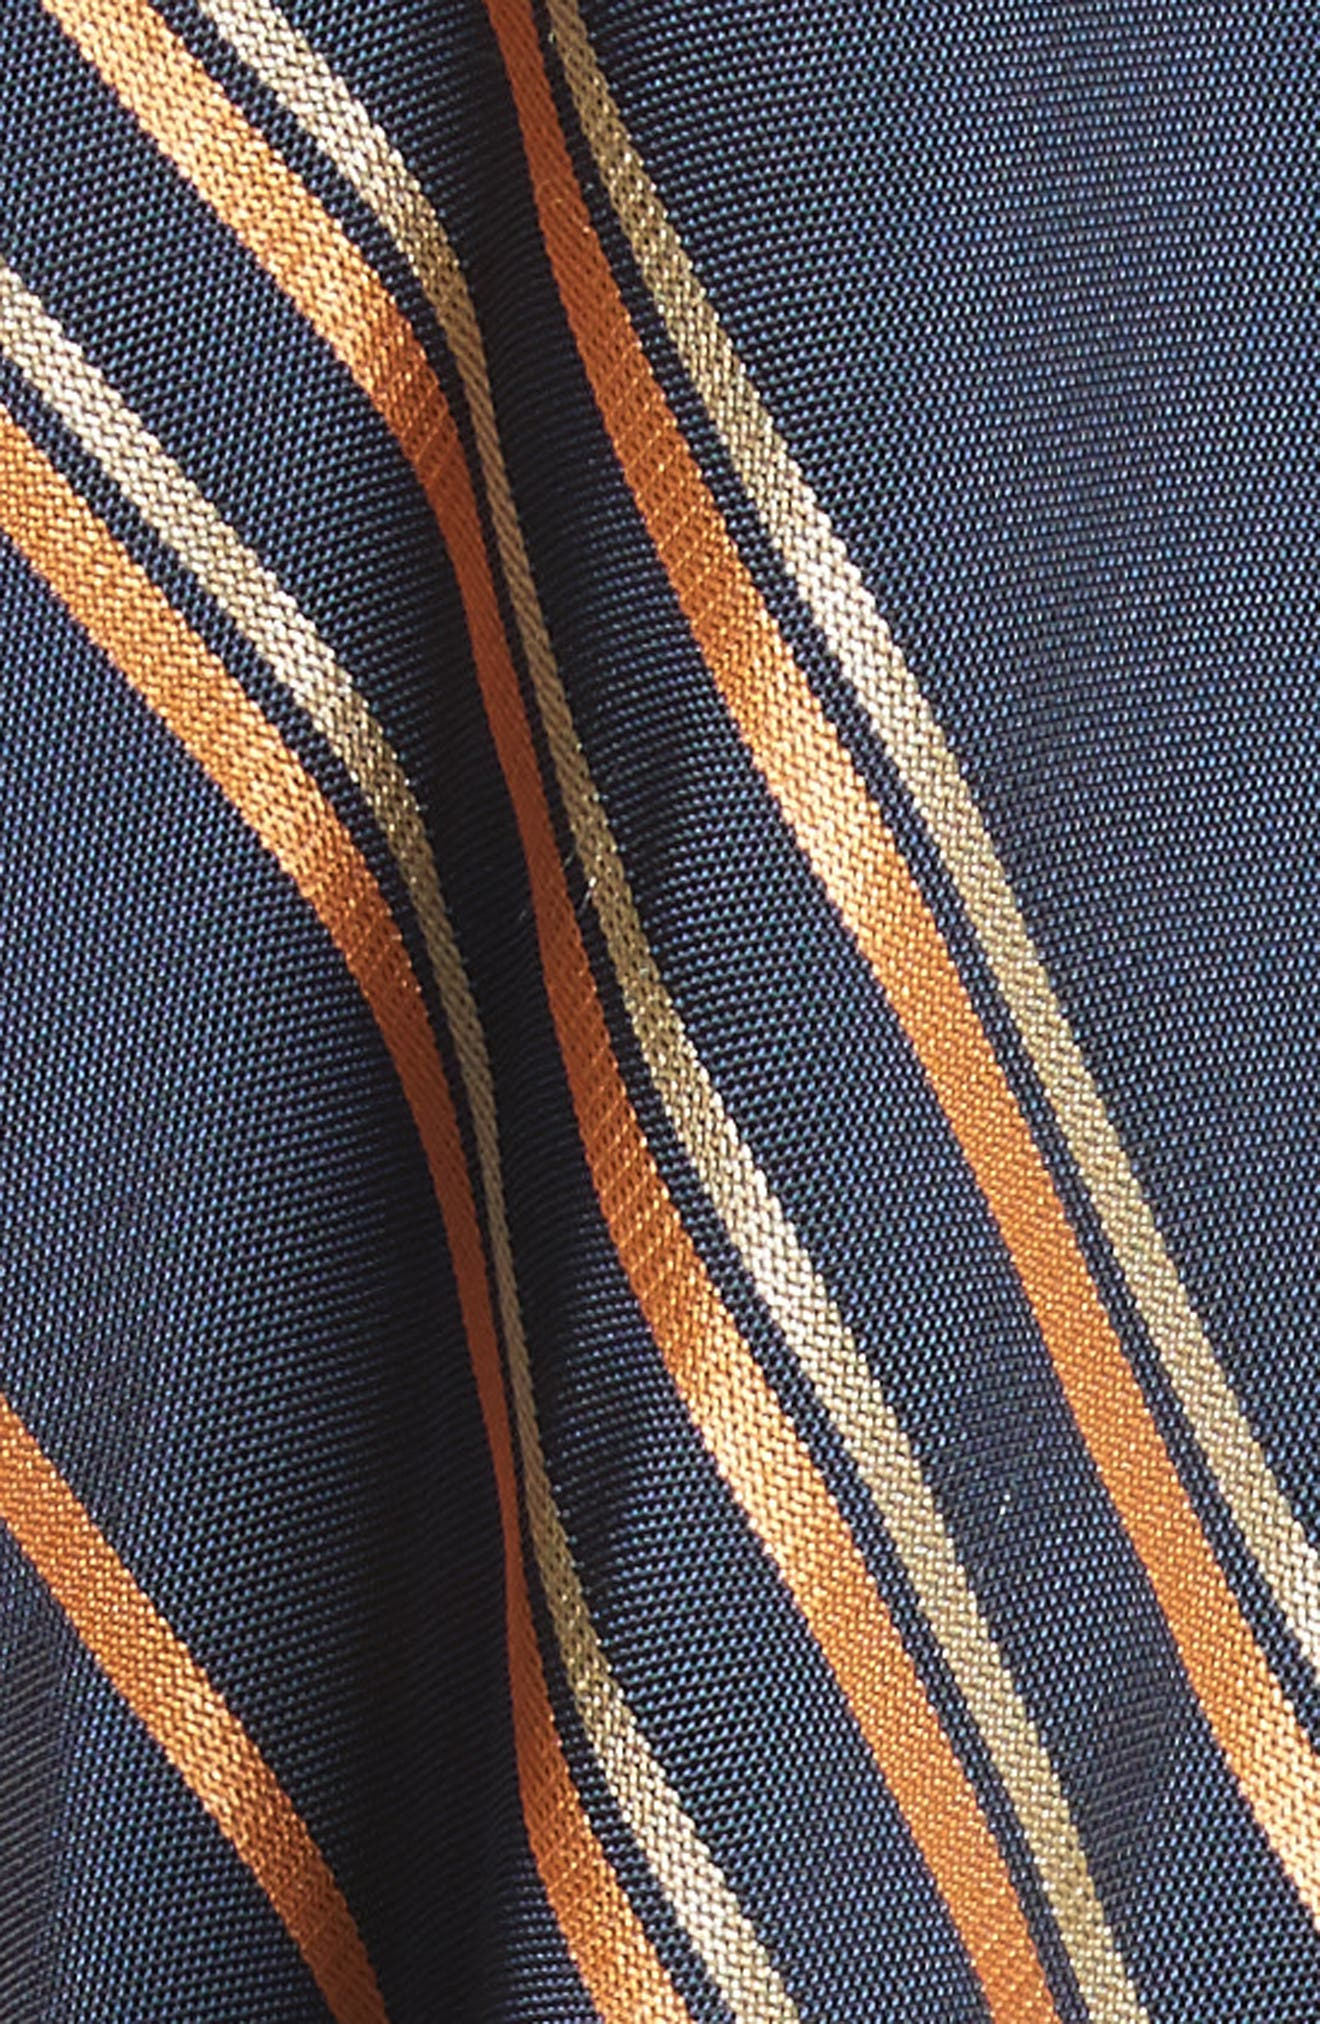 Stripe Dress,                             Alternate thumbnail 5, color,                             460